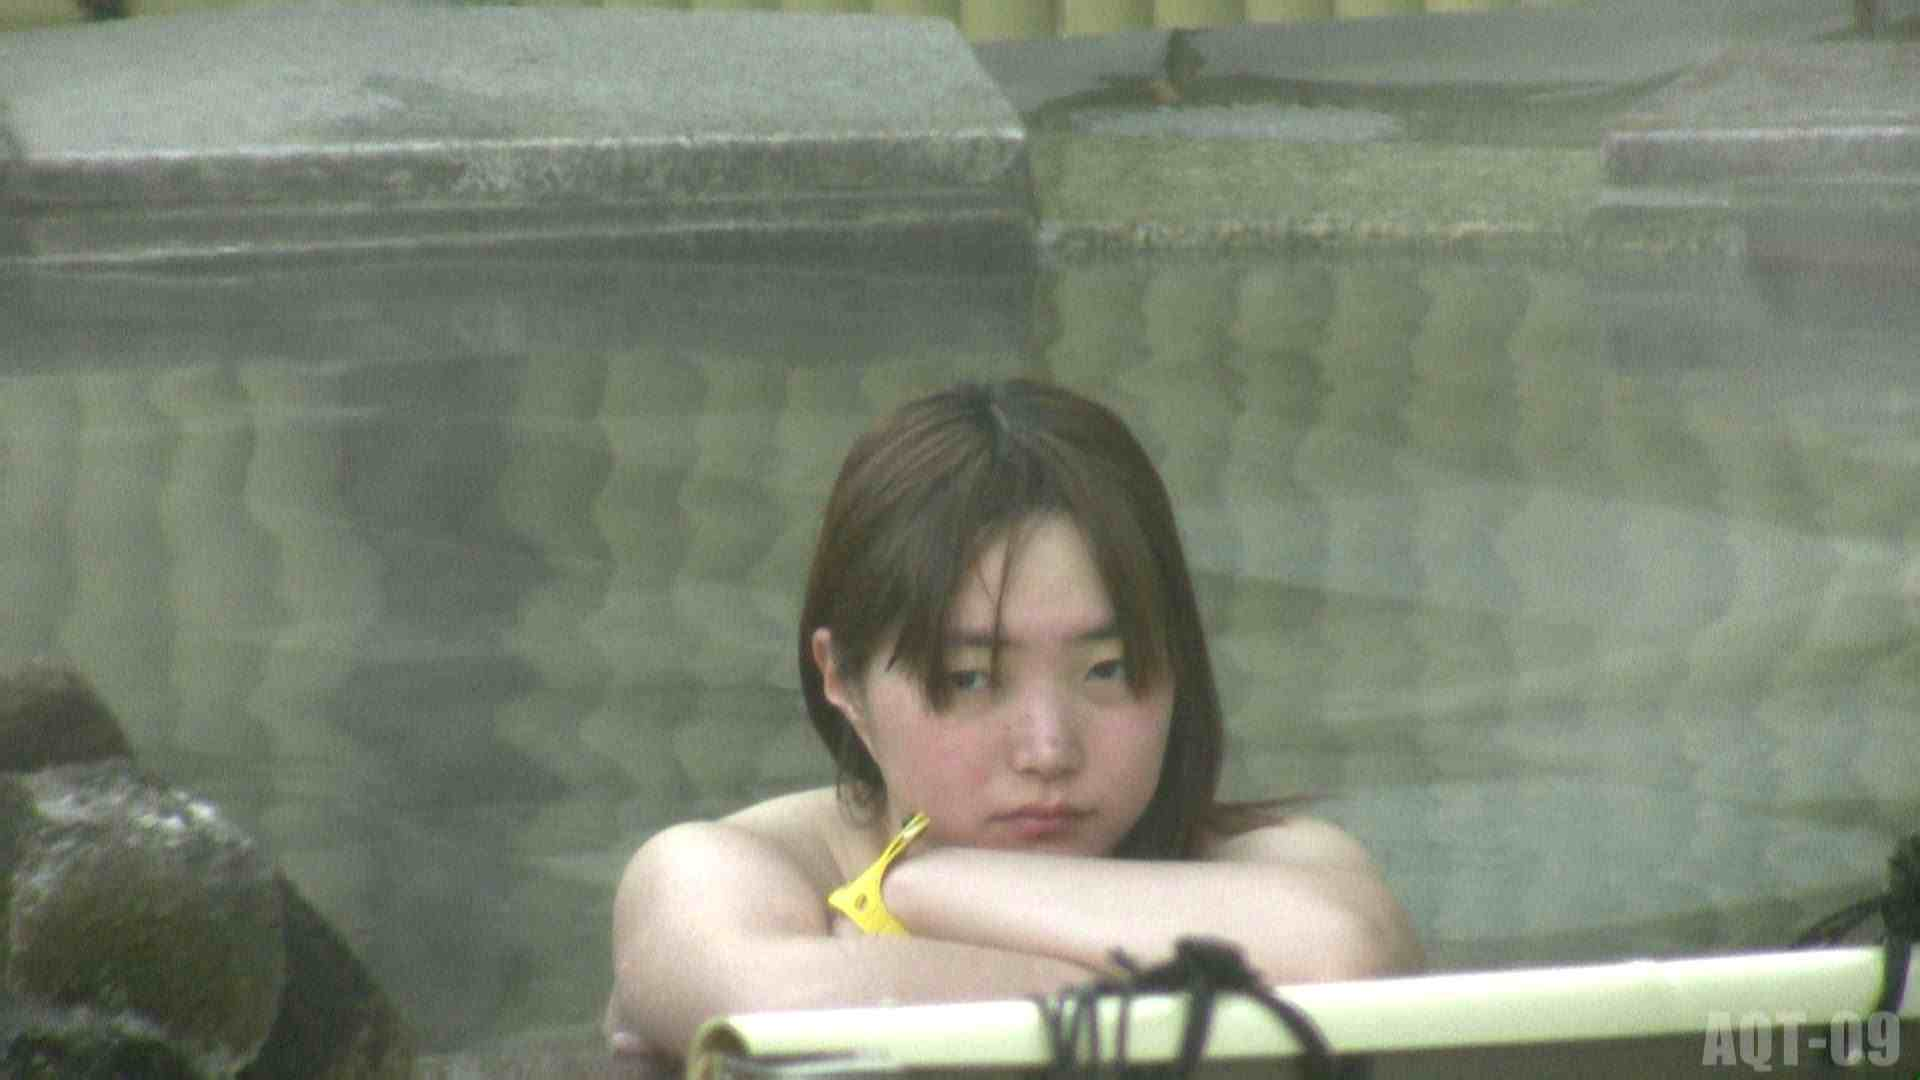 Aquaな露天風呂Vol.781 露天風呂   OLのエロ生活  93連発 73